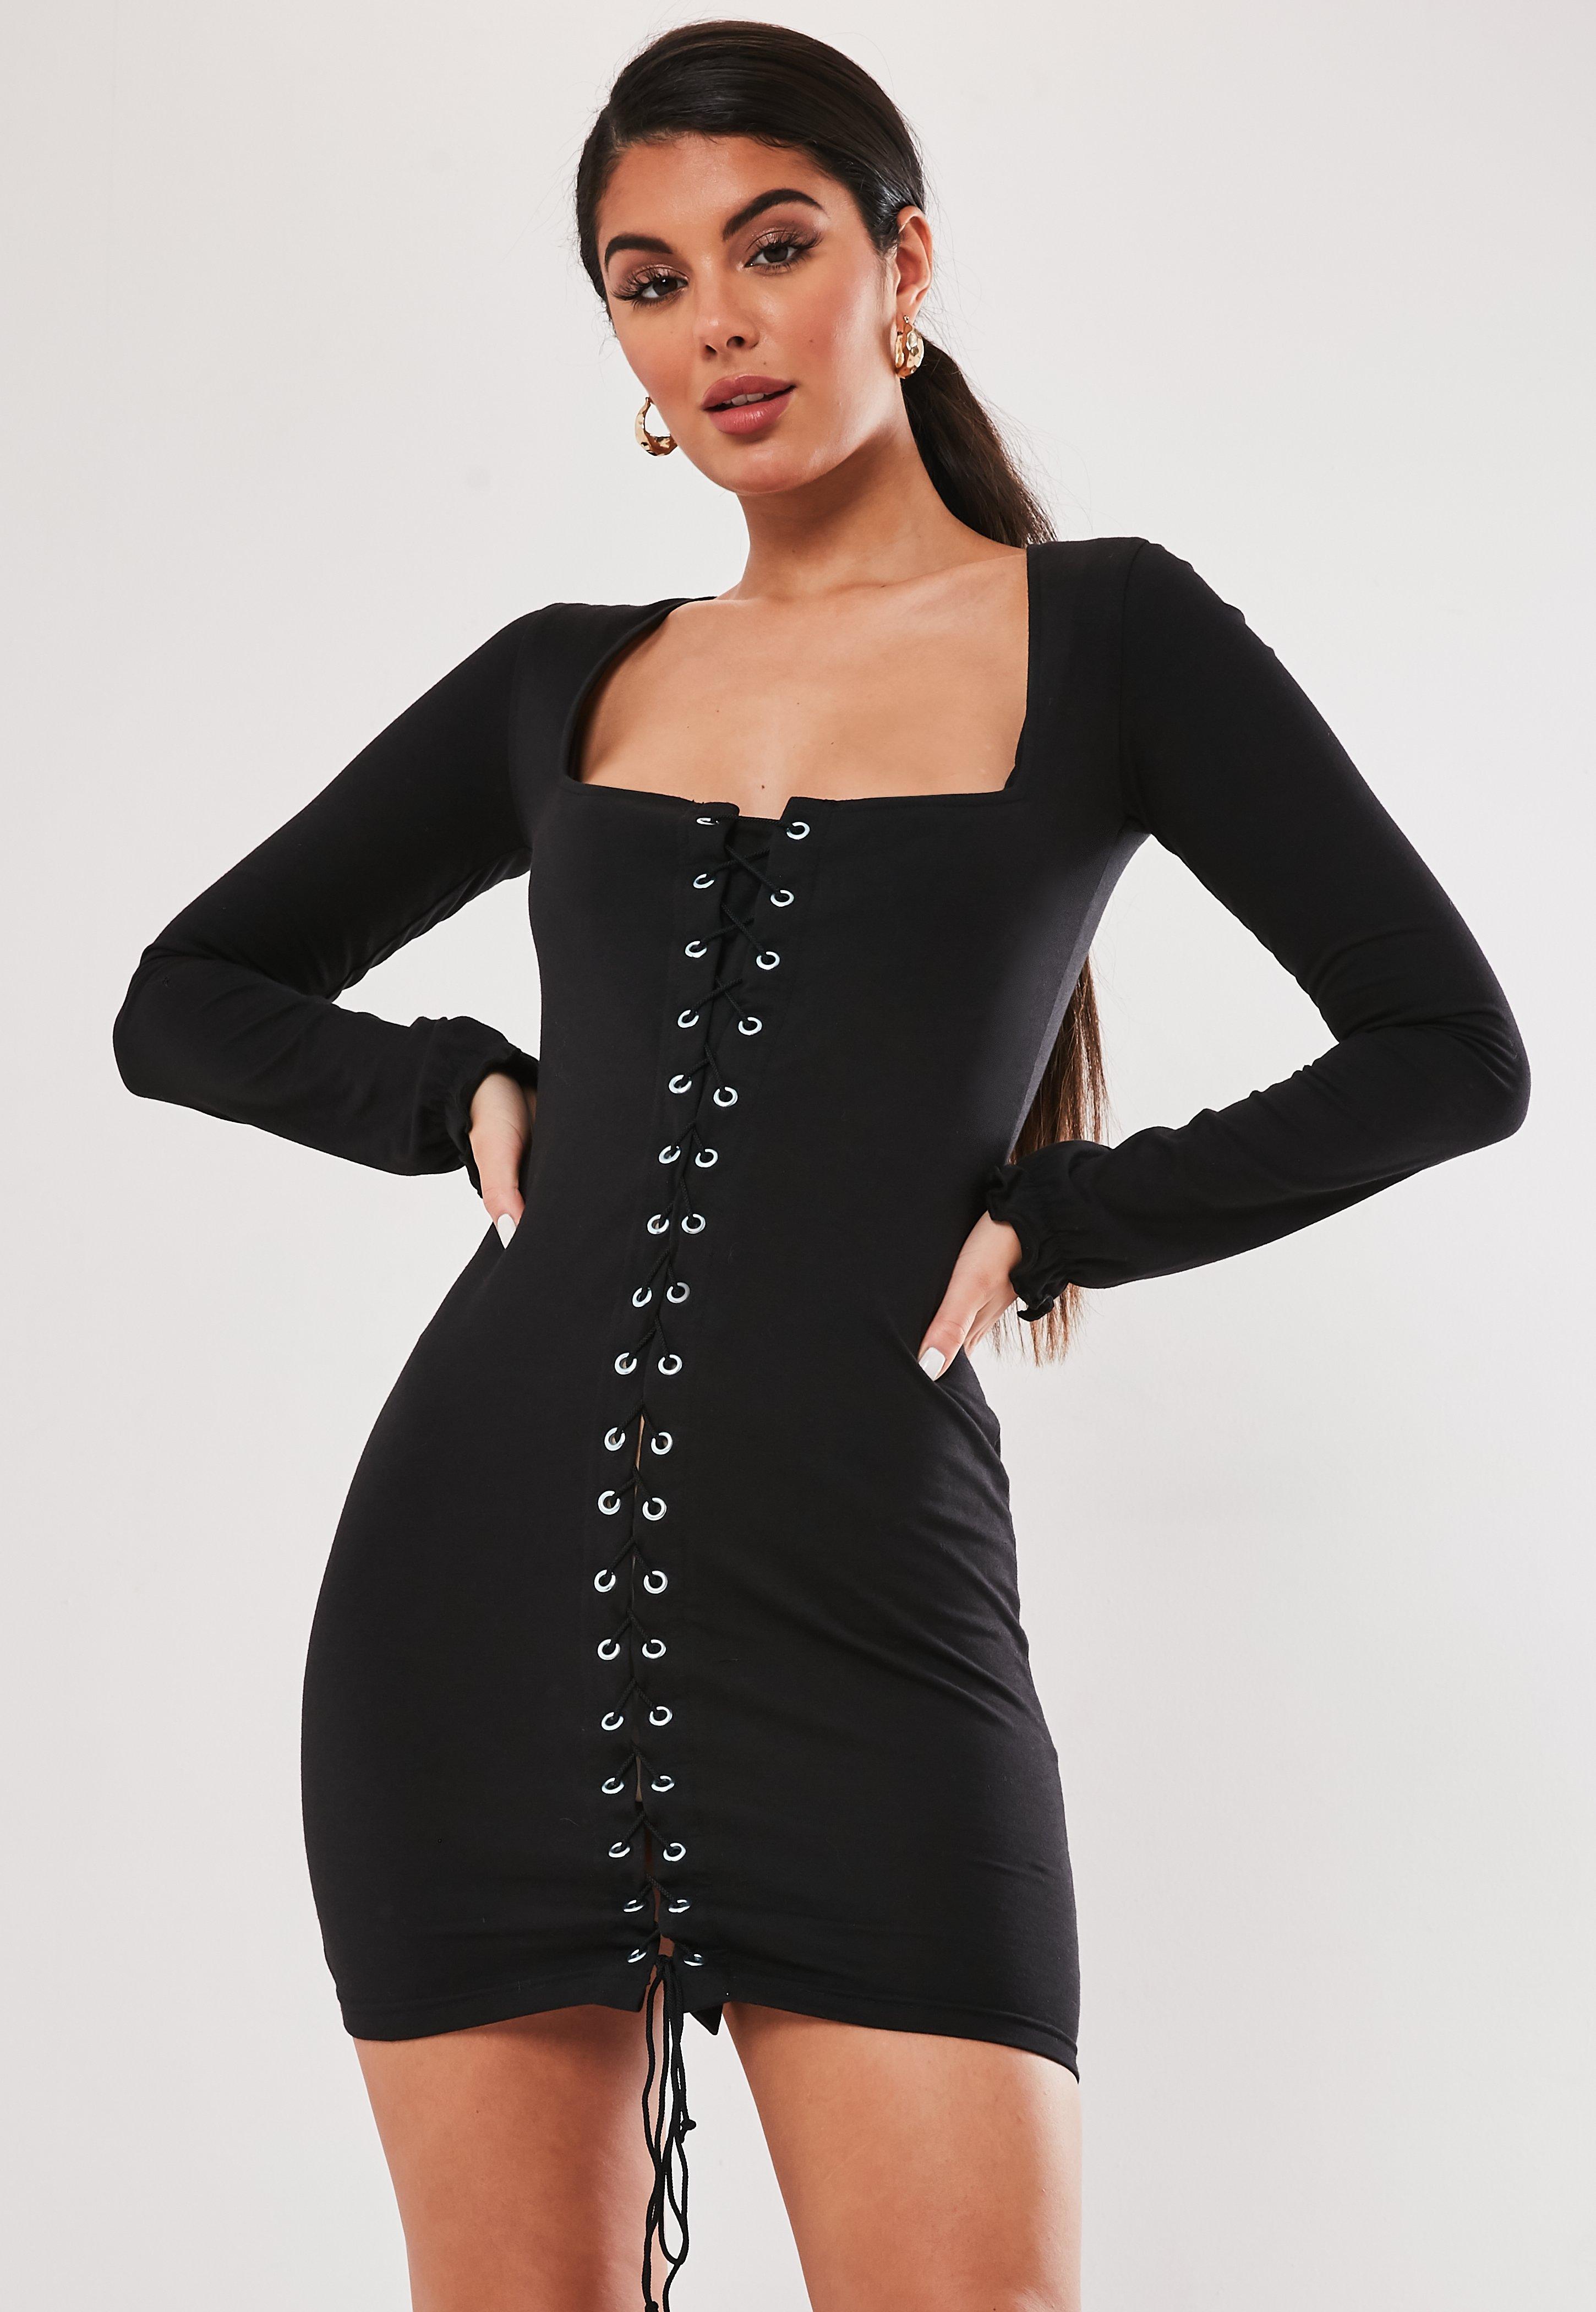 Black Lace Up Front Mini Dress